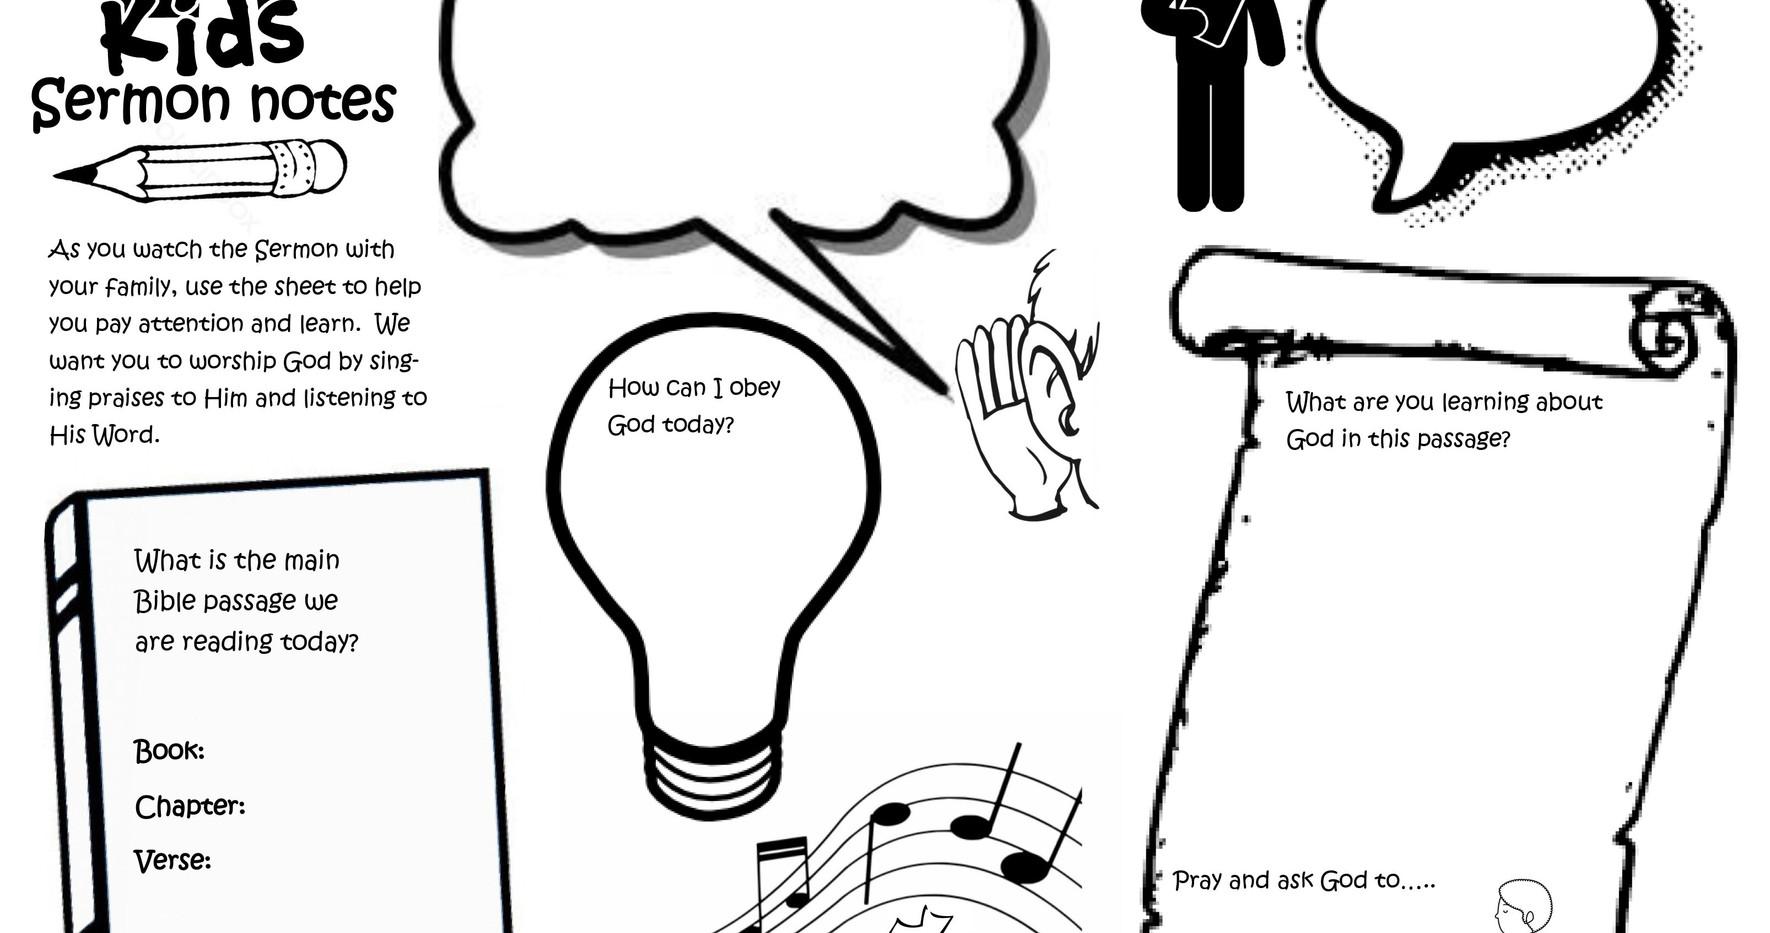 Kids sermon notes.jpg